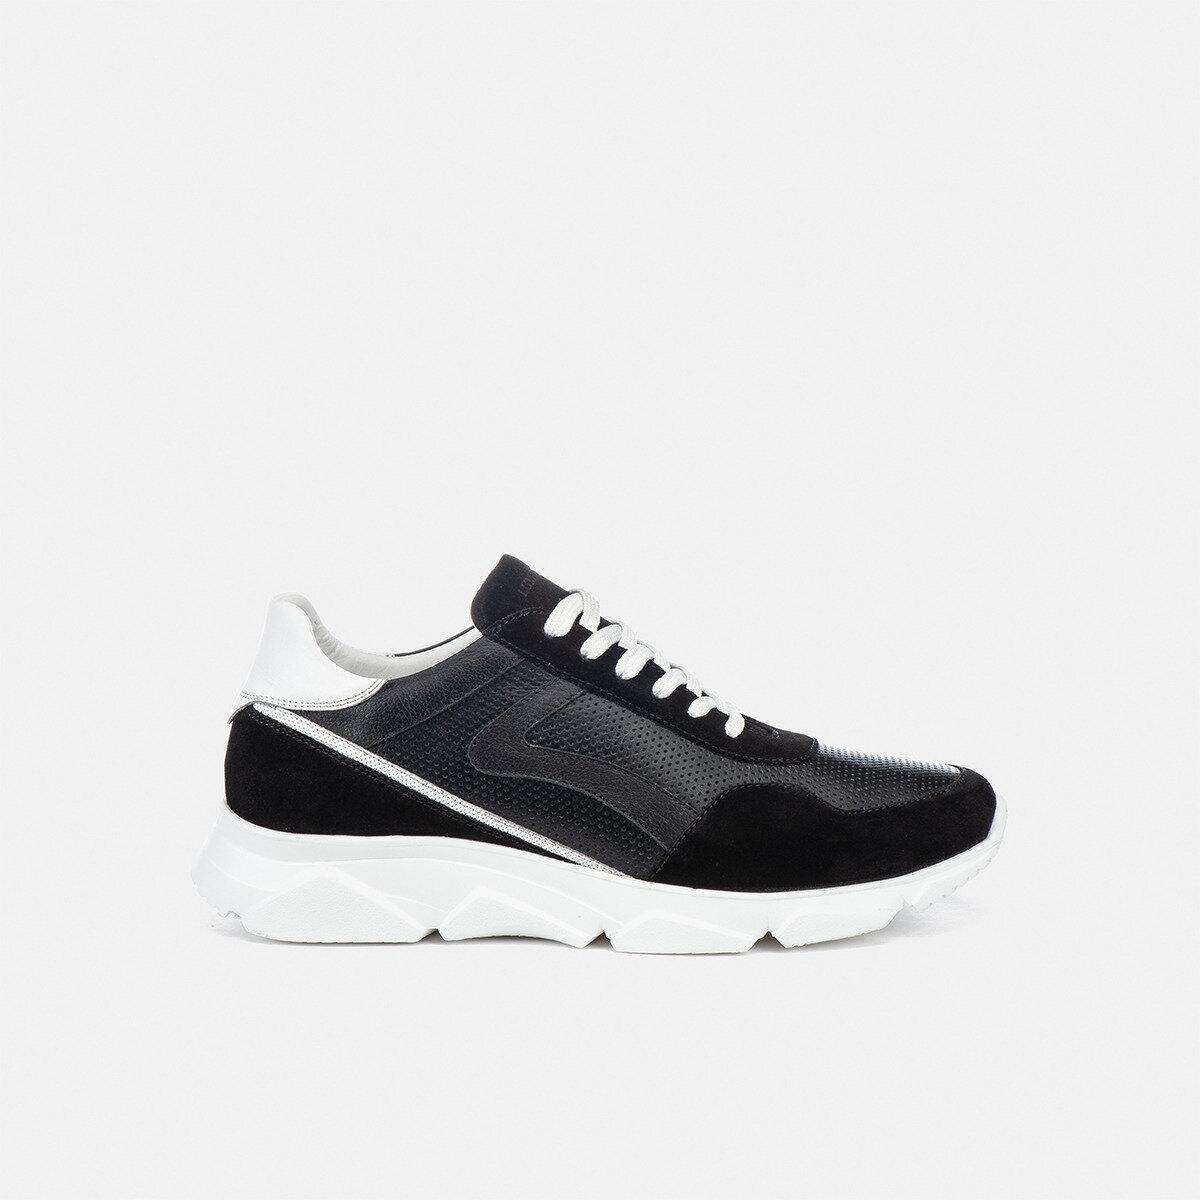 BERRET BLACK/WHITE Man Sneakers